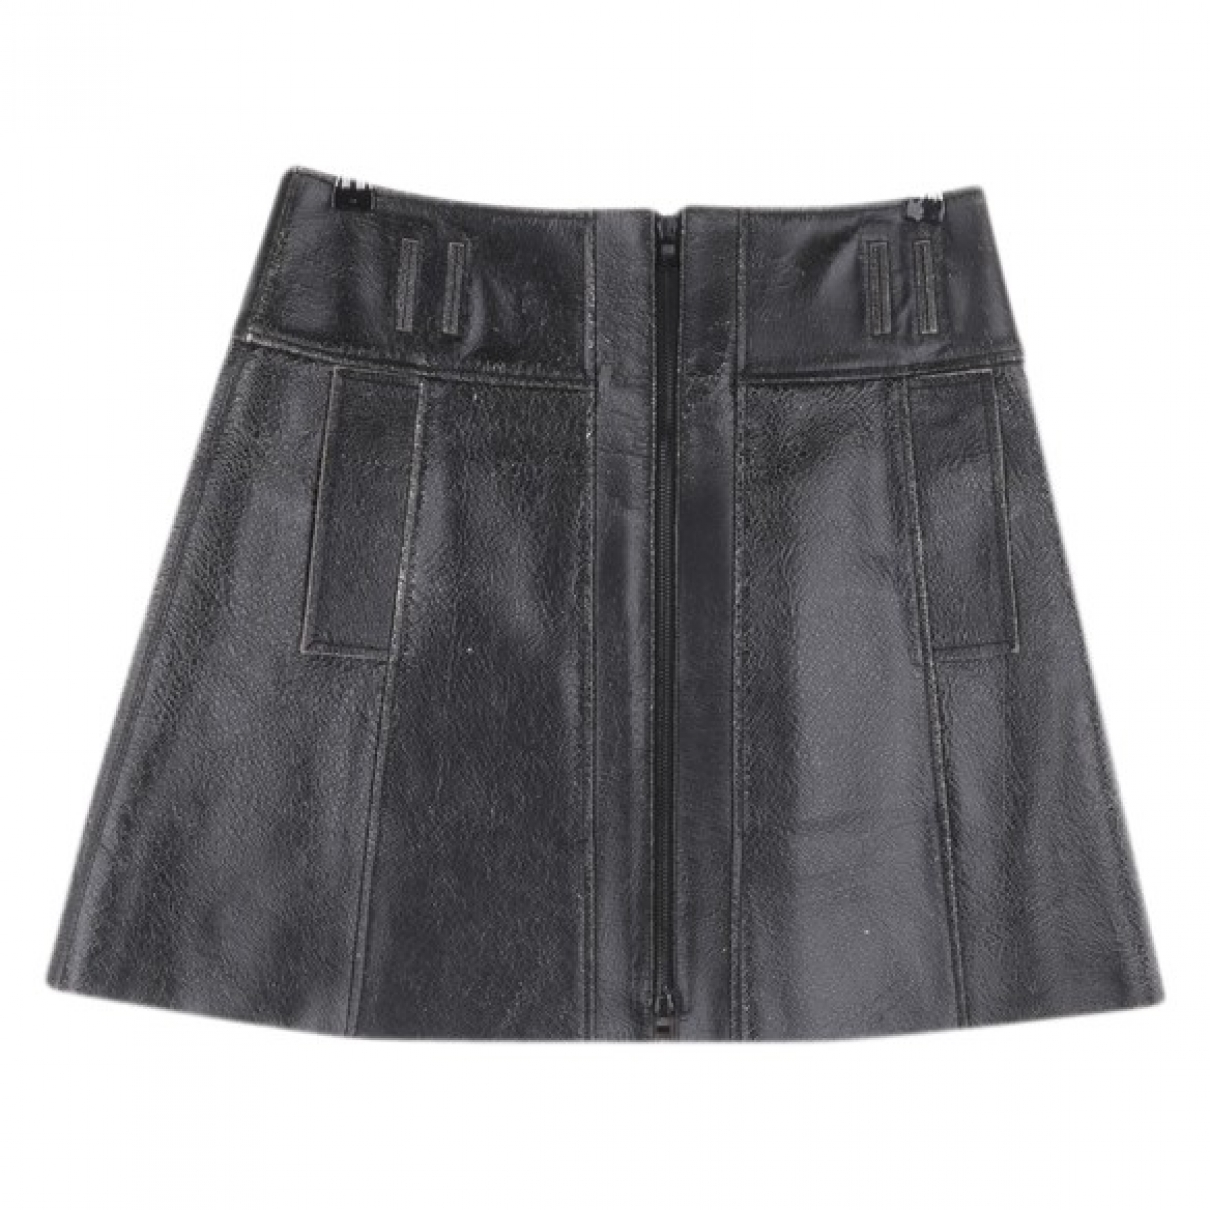 Proenza Schouler \N Black Leather skirt for Women 32 FR